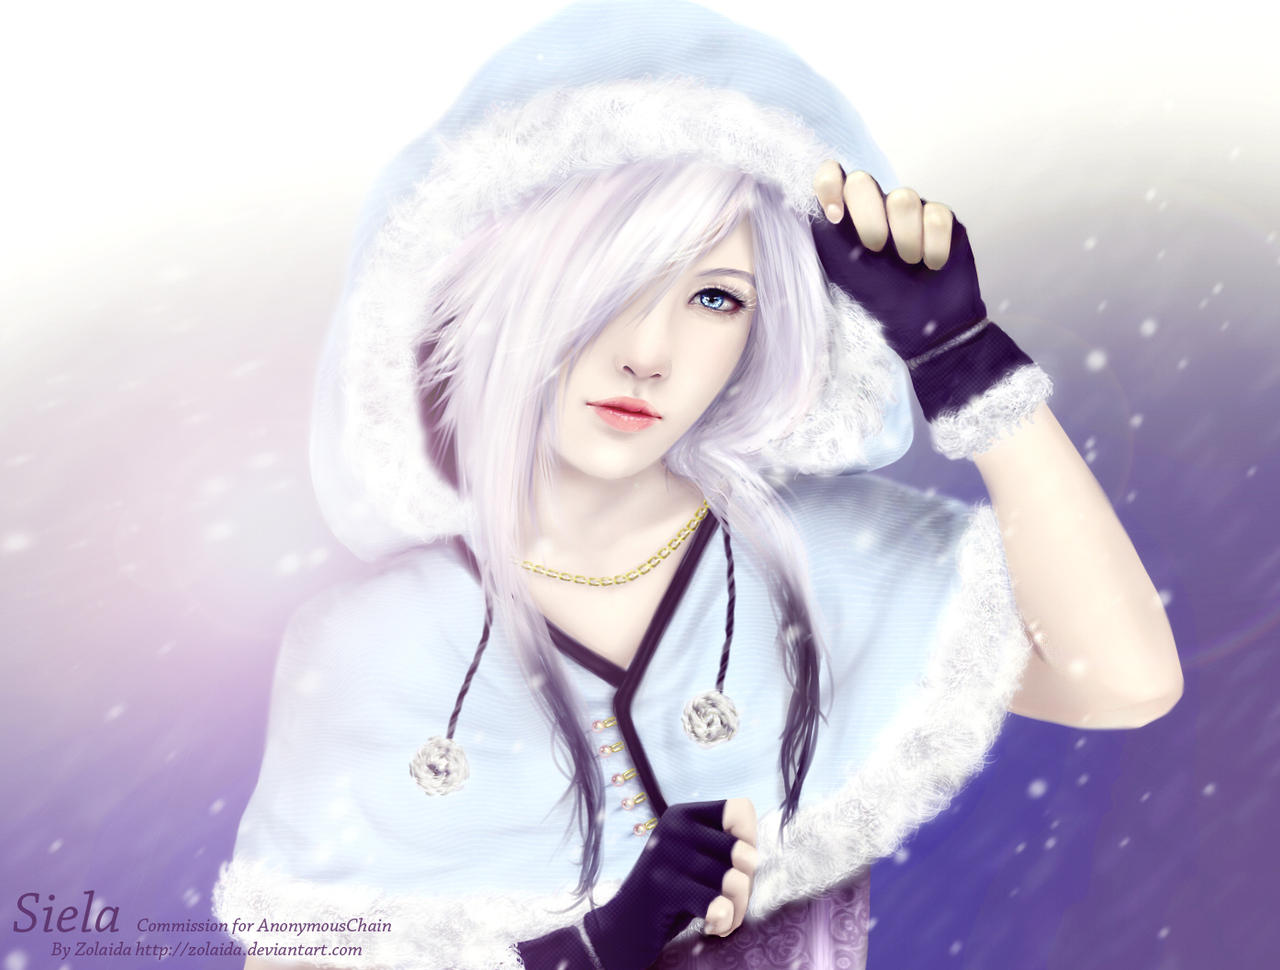 Anime Girl Cutting Herself Snow Star  So Costume